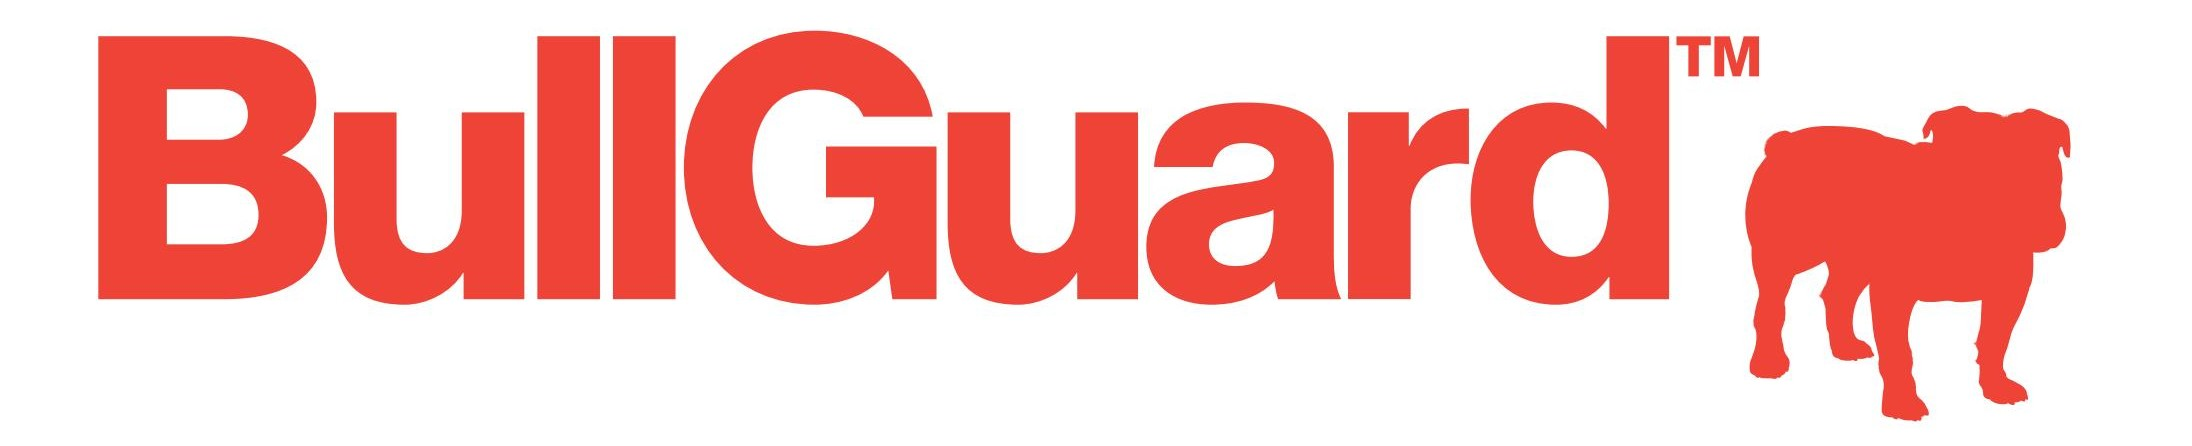 Bullguard.com